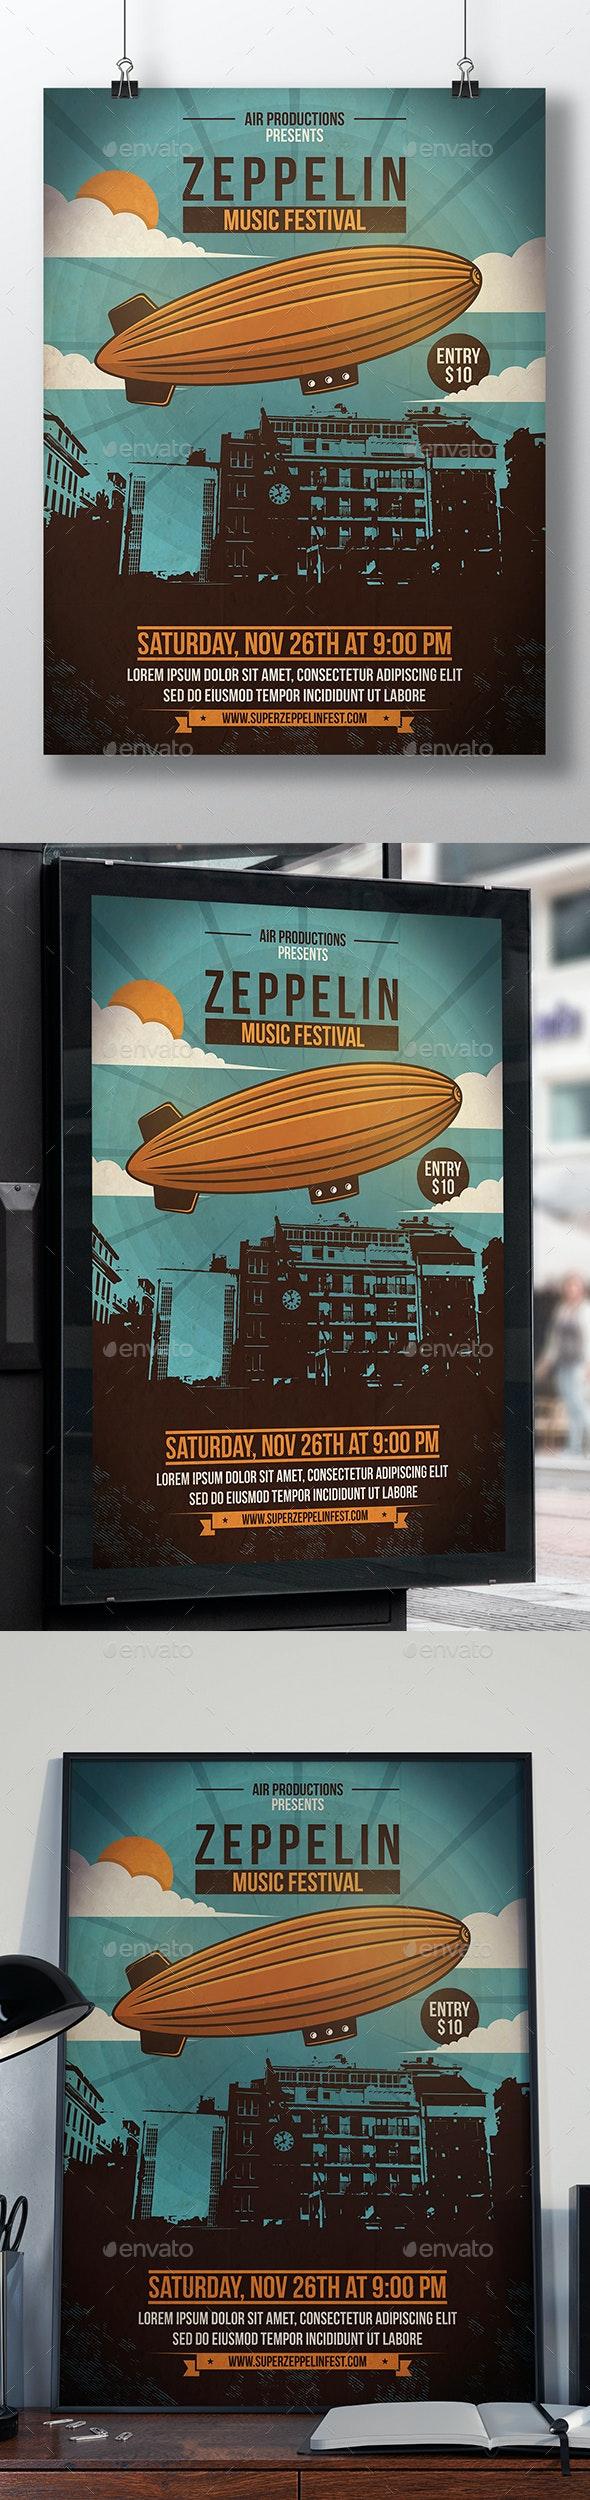 Sky Zeppelin Flyer Template - Miscellaneous Events